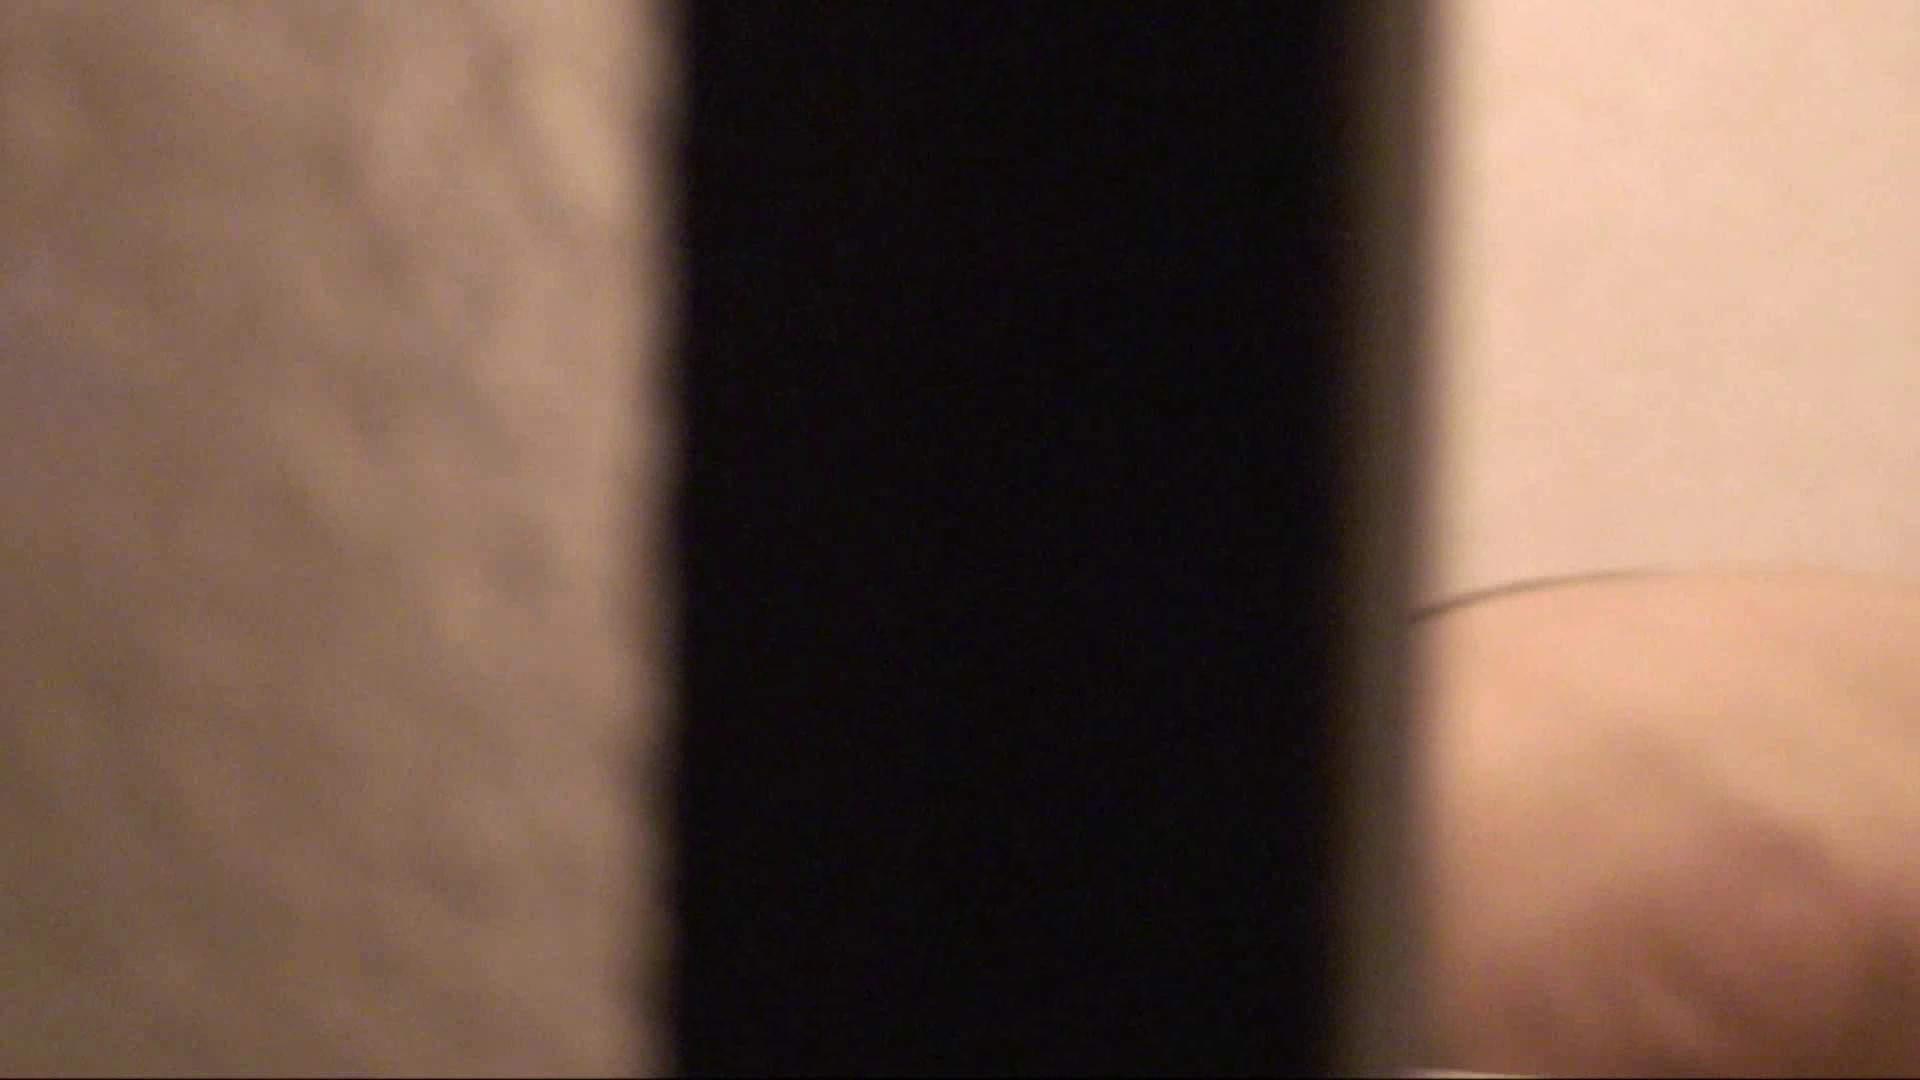 vol.01必見!白肌嬢の乳首が丸見え。極上美人のすっぴん顔をハイビジョンで! 美乳 | 美人編  71画像 55